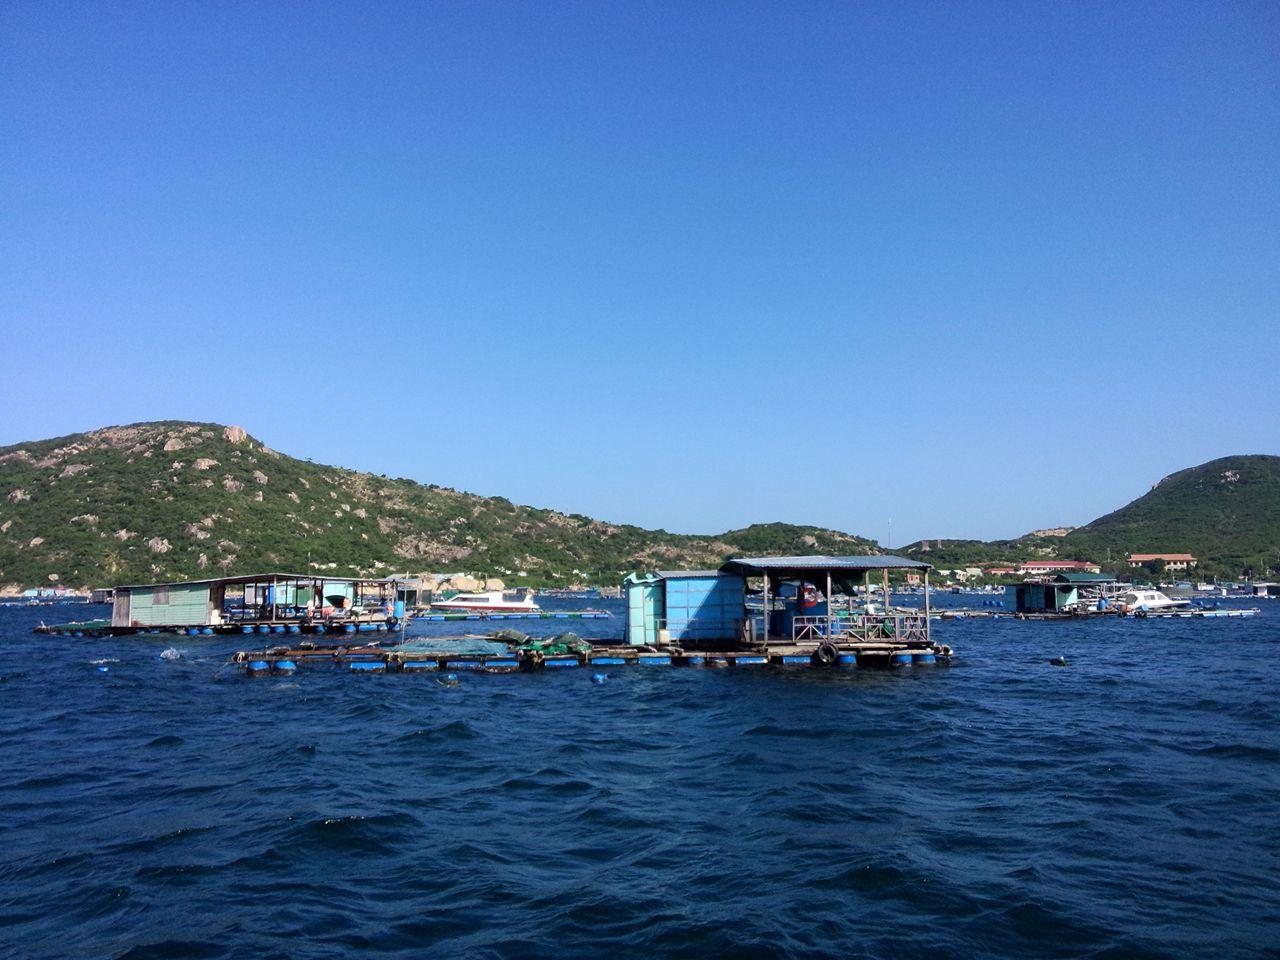 Fish-Farm-Binh-Ba-Island-Cam-Ranh-Khanh-Hoa-Vietnam.jpg